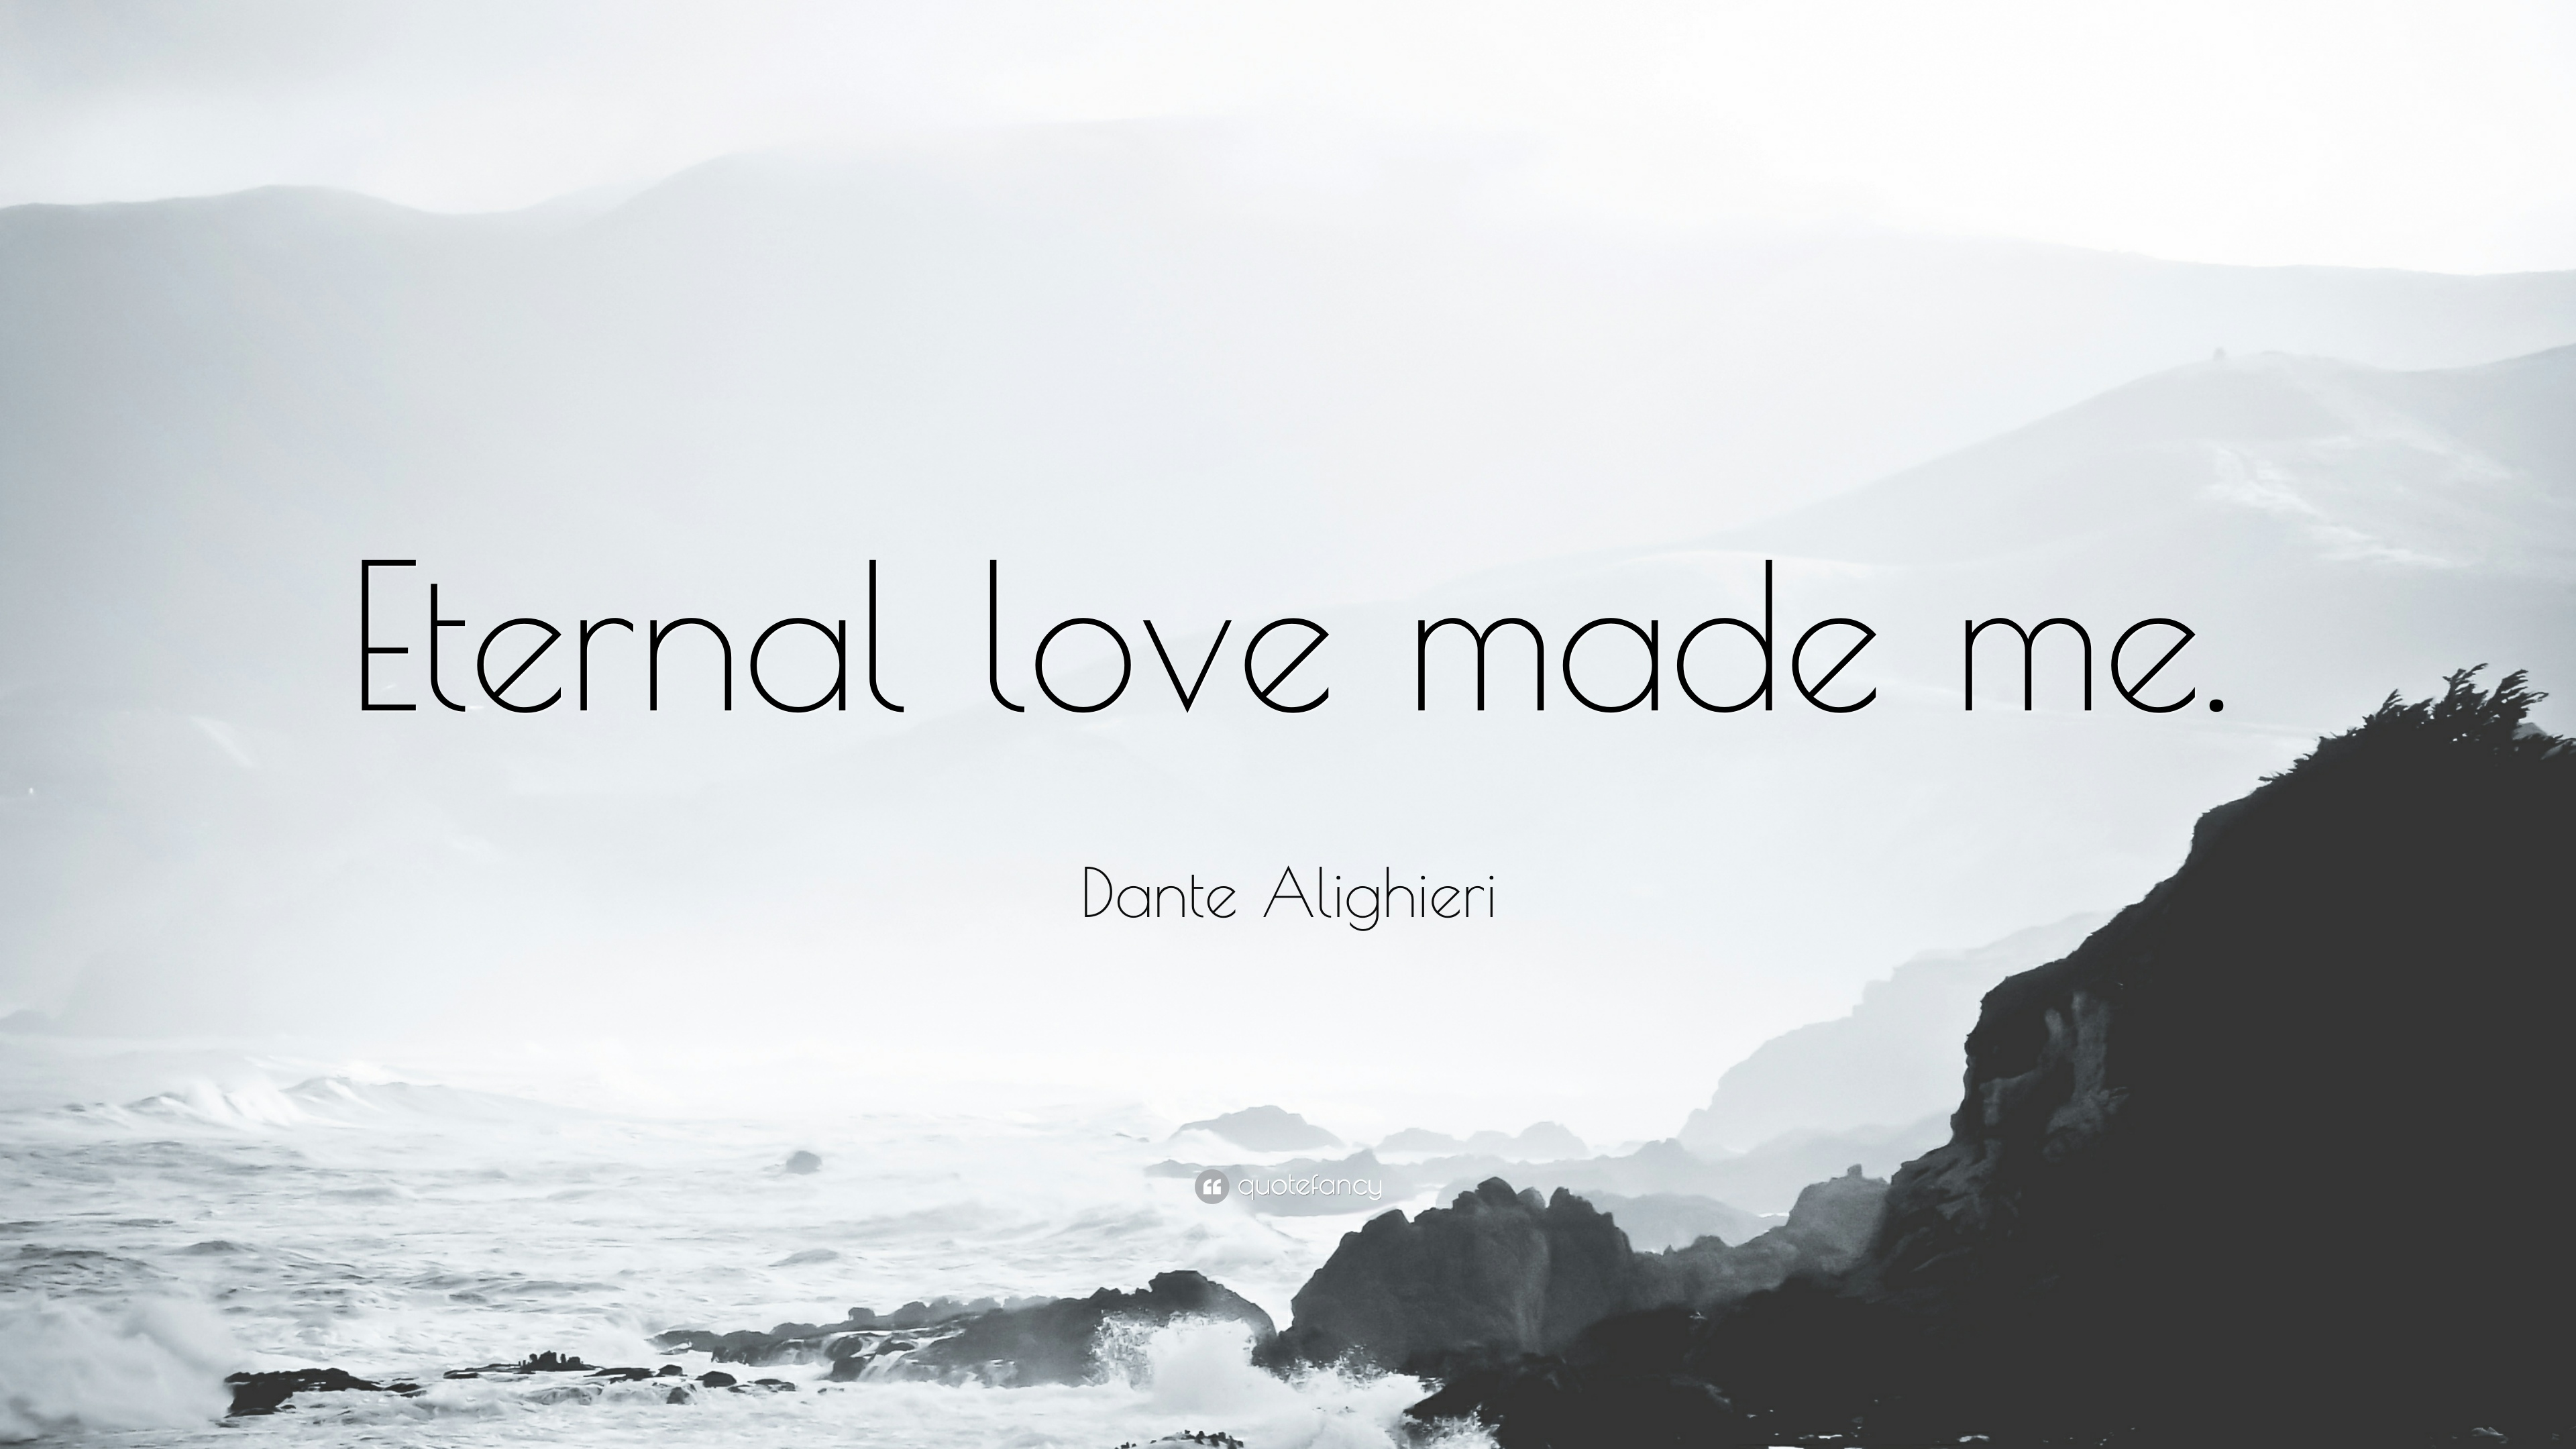 Dante Alighieri Quote: U201cEternal Love Made Me.u201d